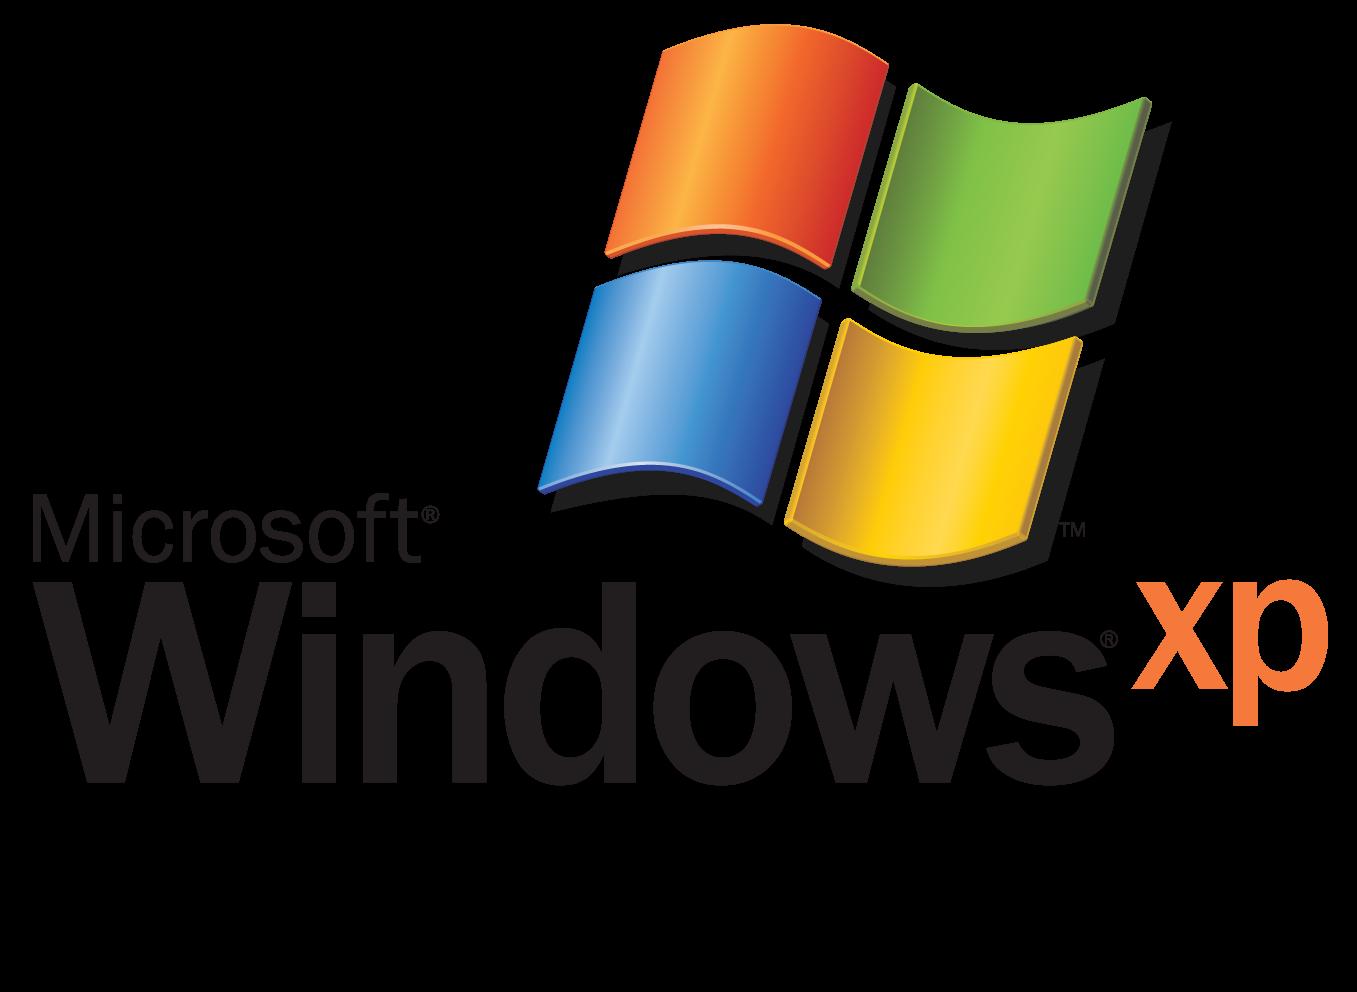 Umur windows xp di perpanjang hingga tahun 2015